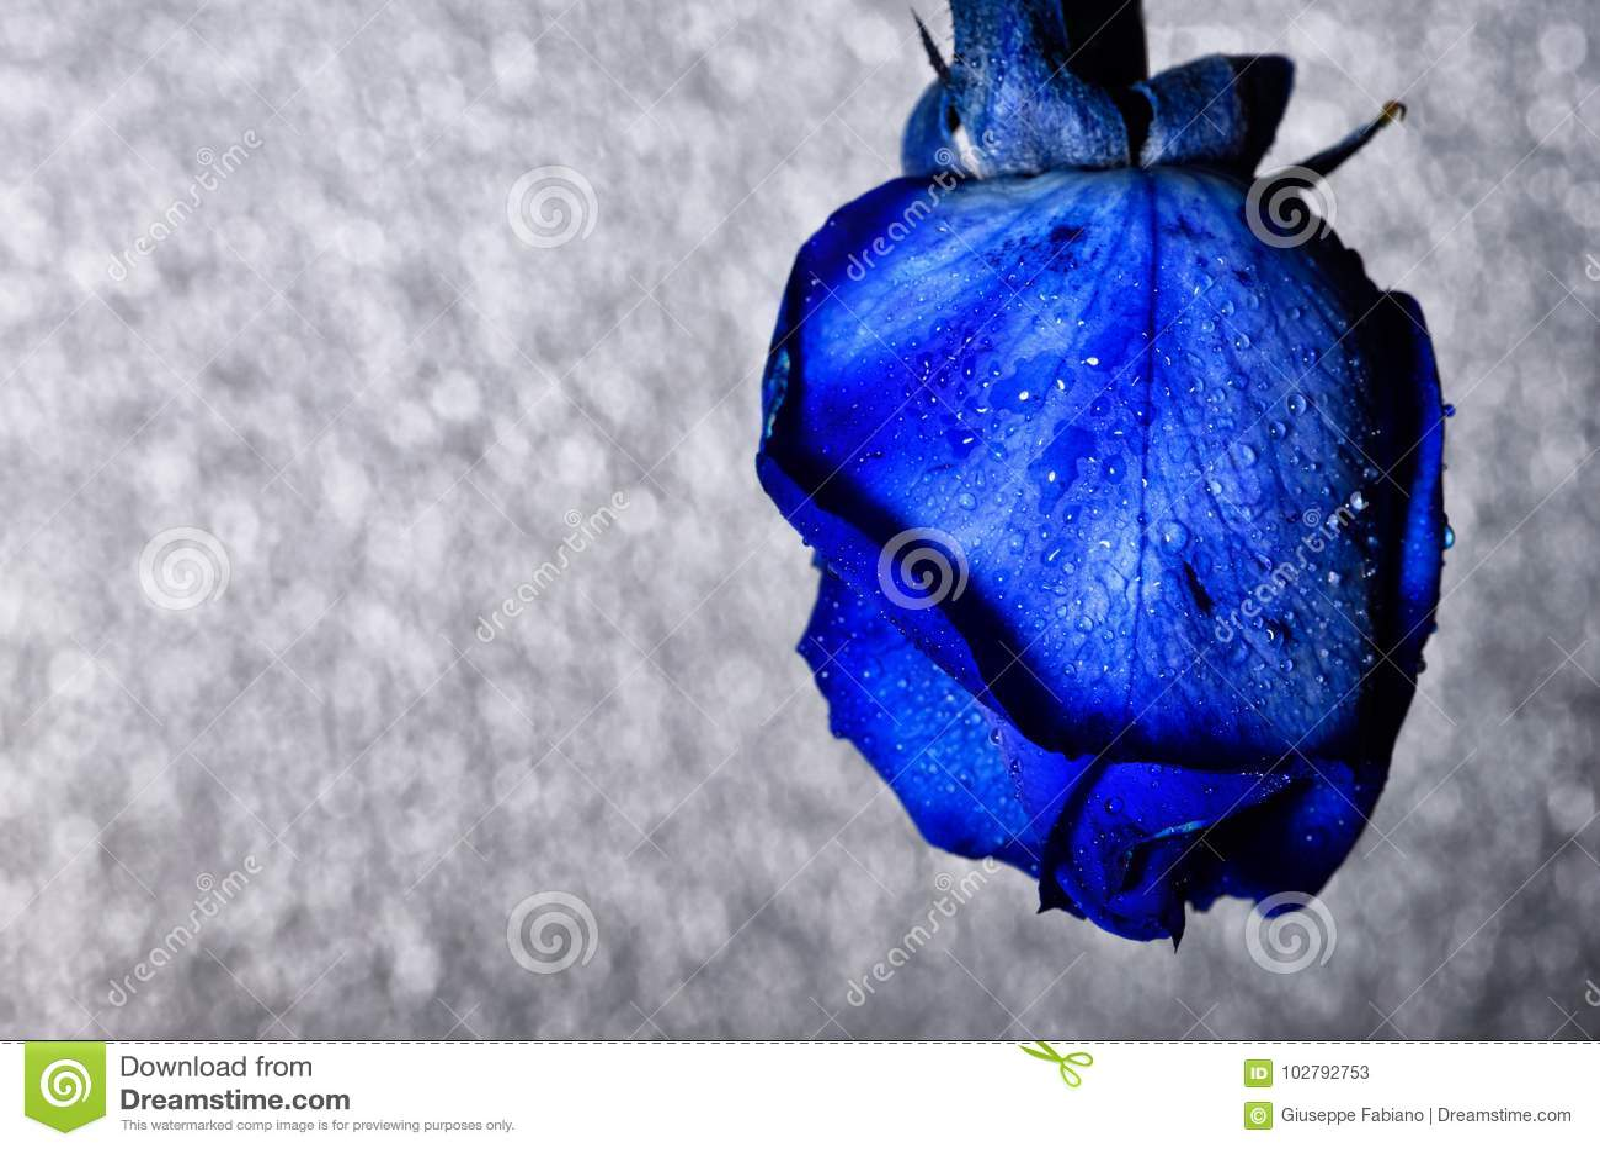 The concept of macro beauty of flowers cxxxxi stock image image of download the concept of macro beauty of flowers cxxxxi stock image image of decoration izmirmasajfo